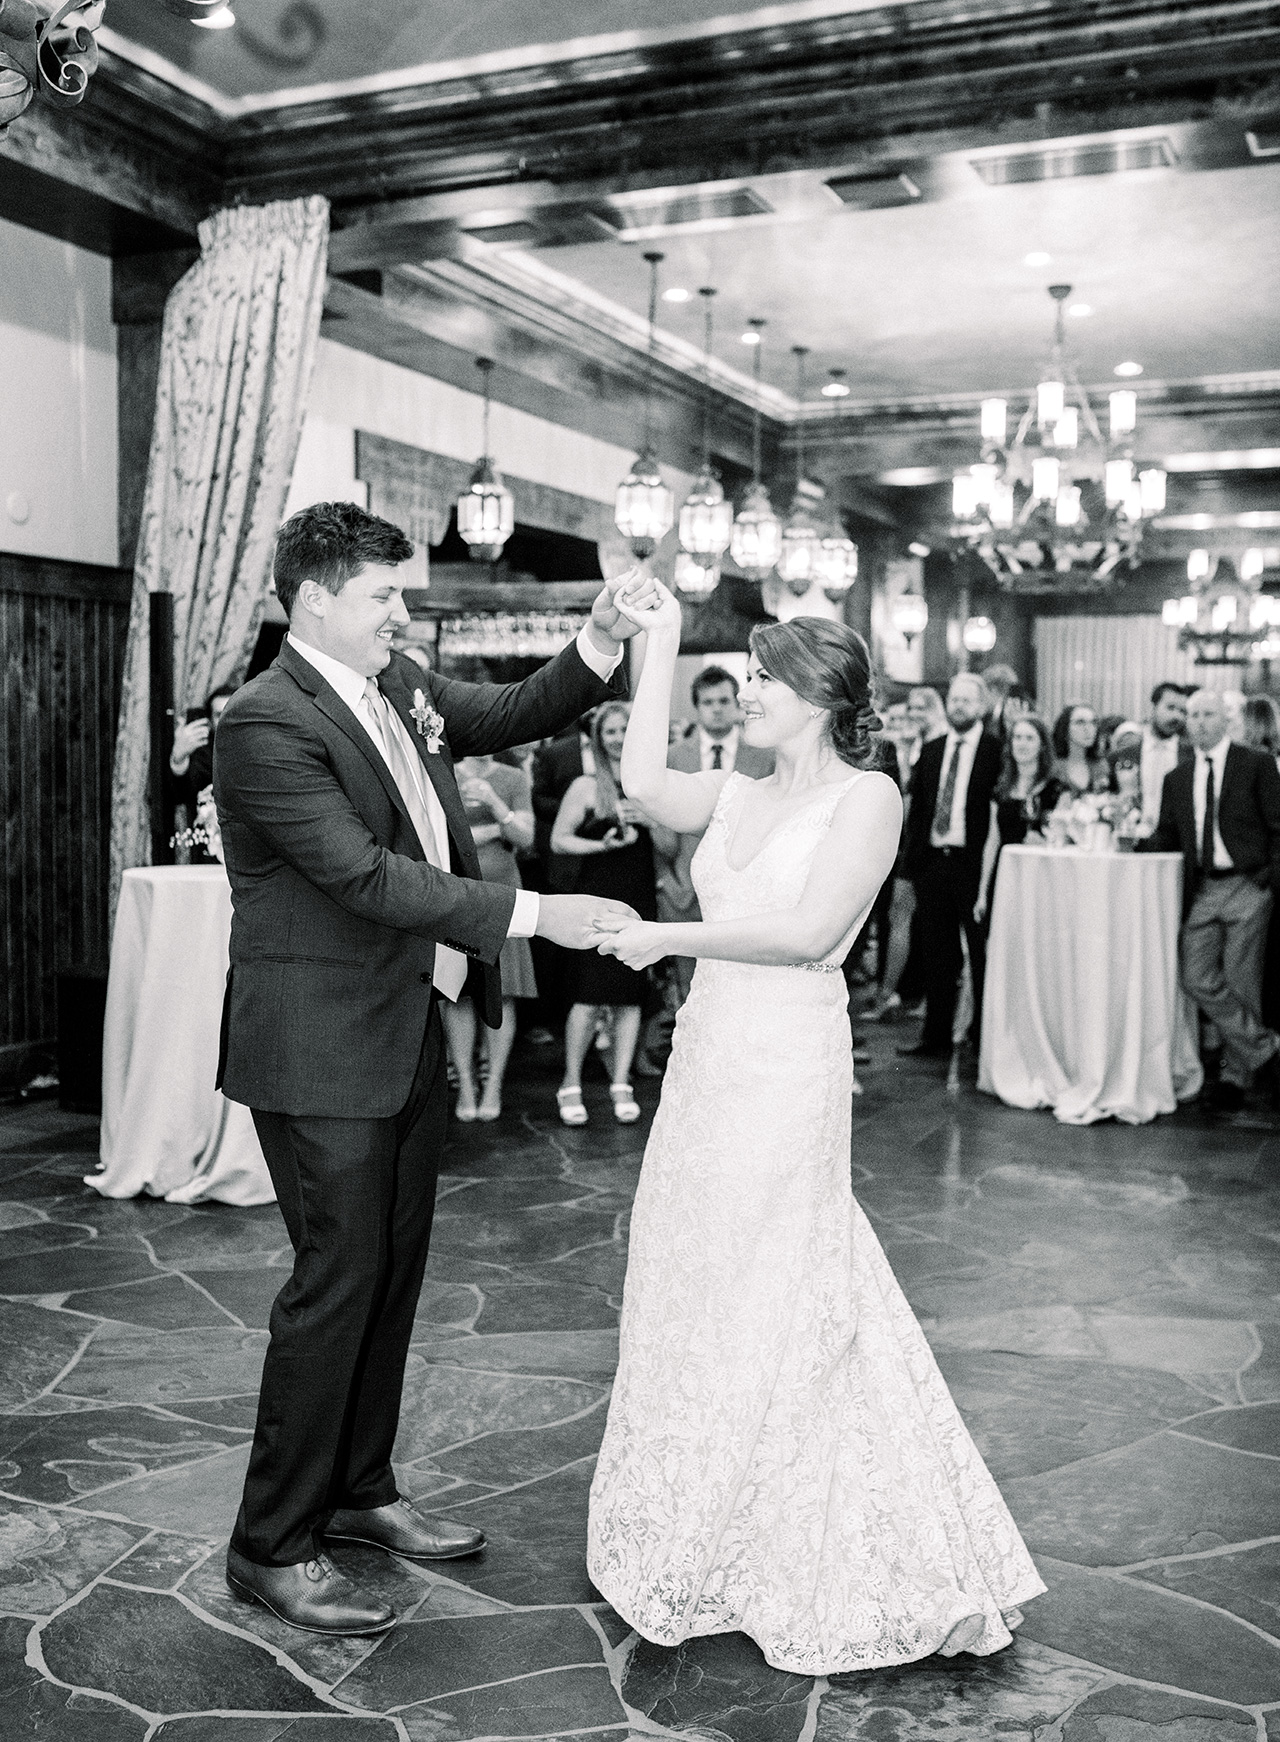 bride groom wedding reception first dance twirl